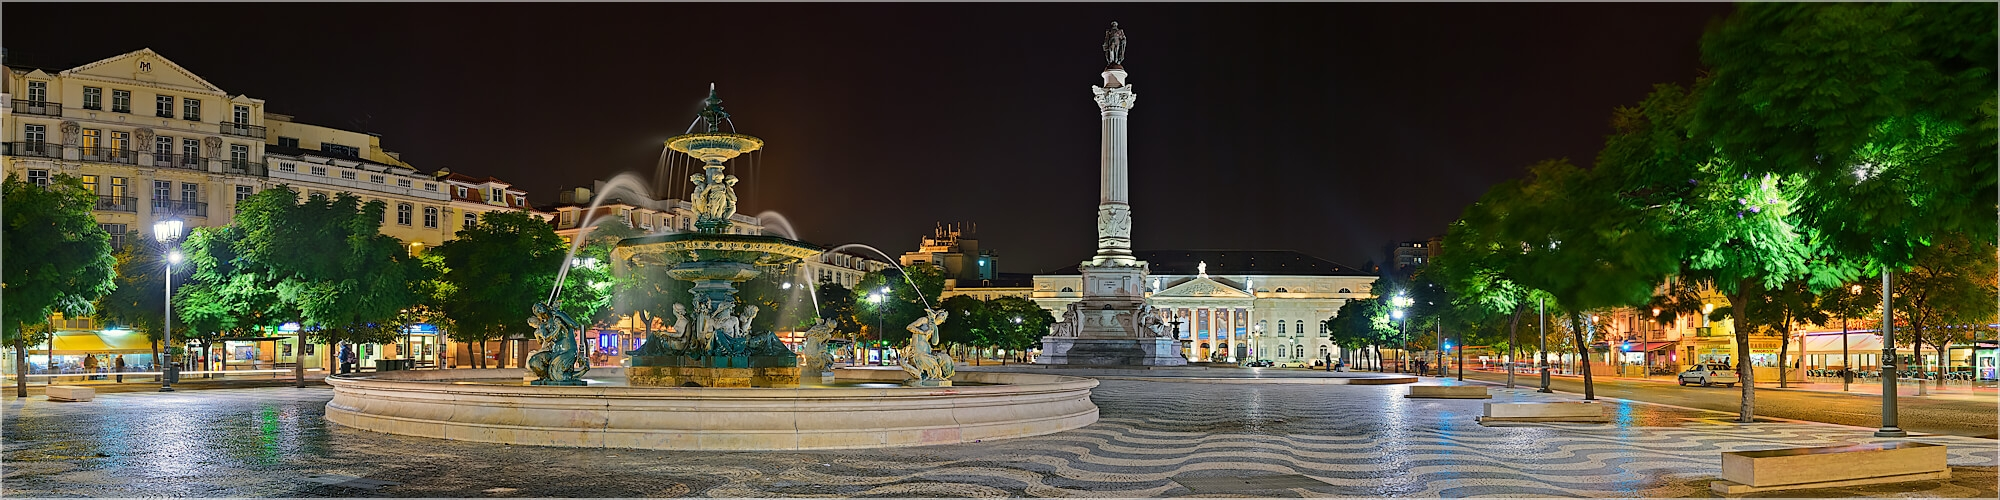 Panoramabild Lissabon Parca Rossio Platz